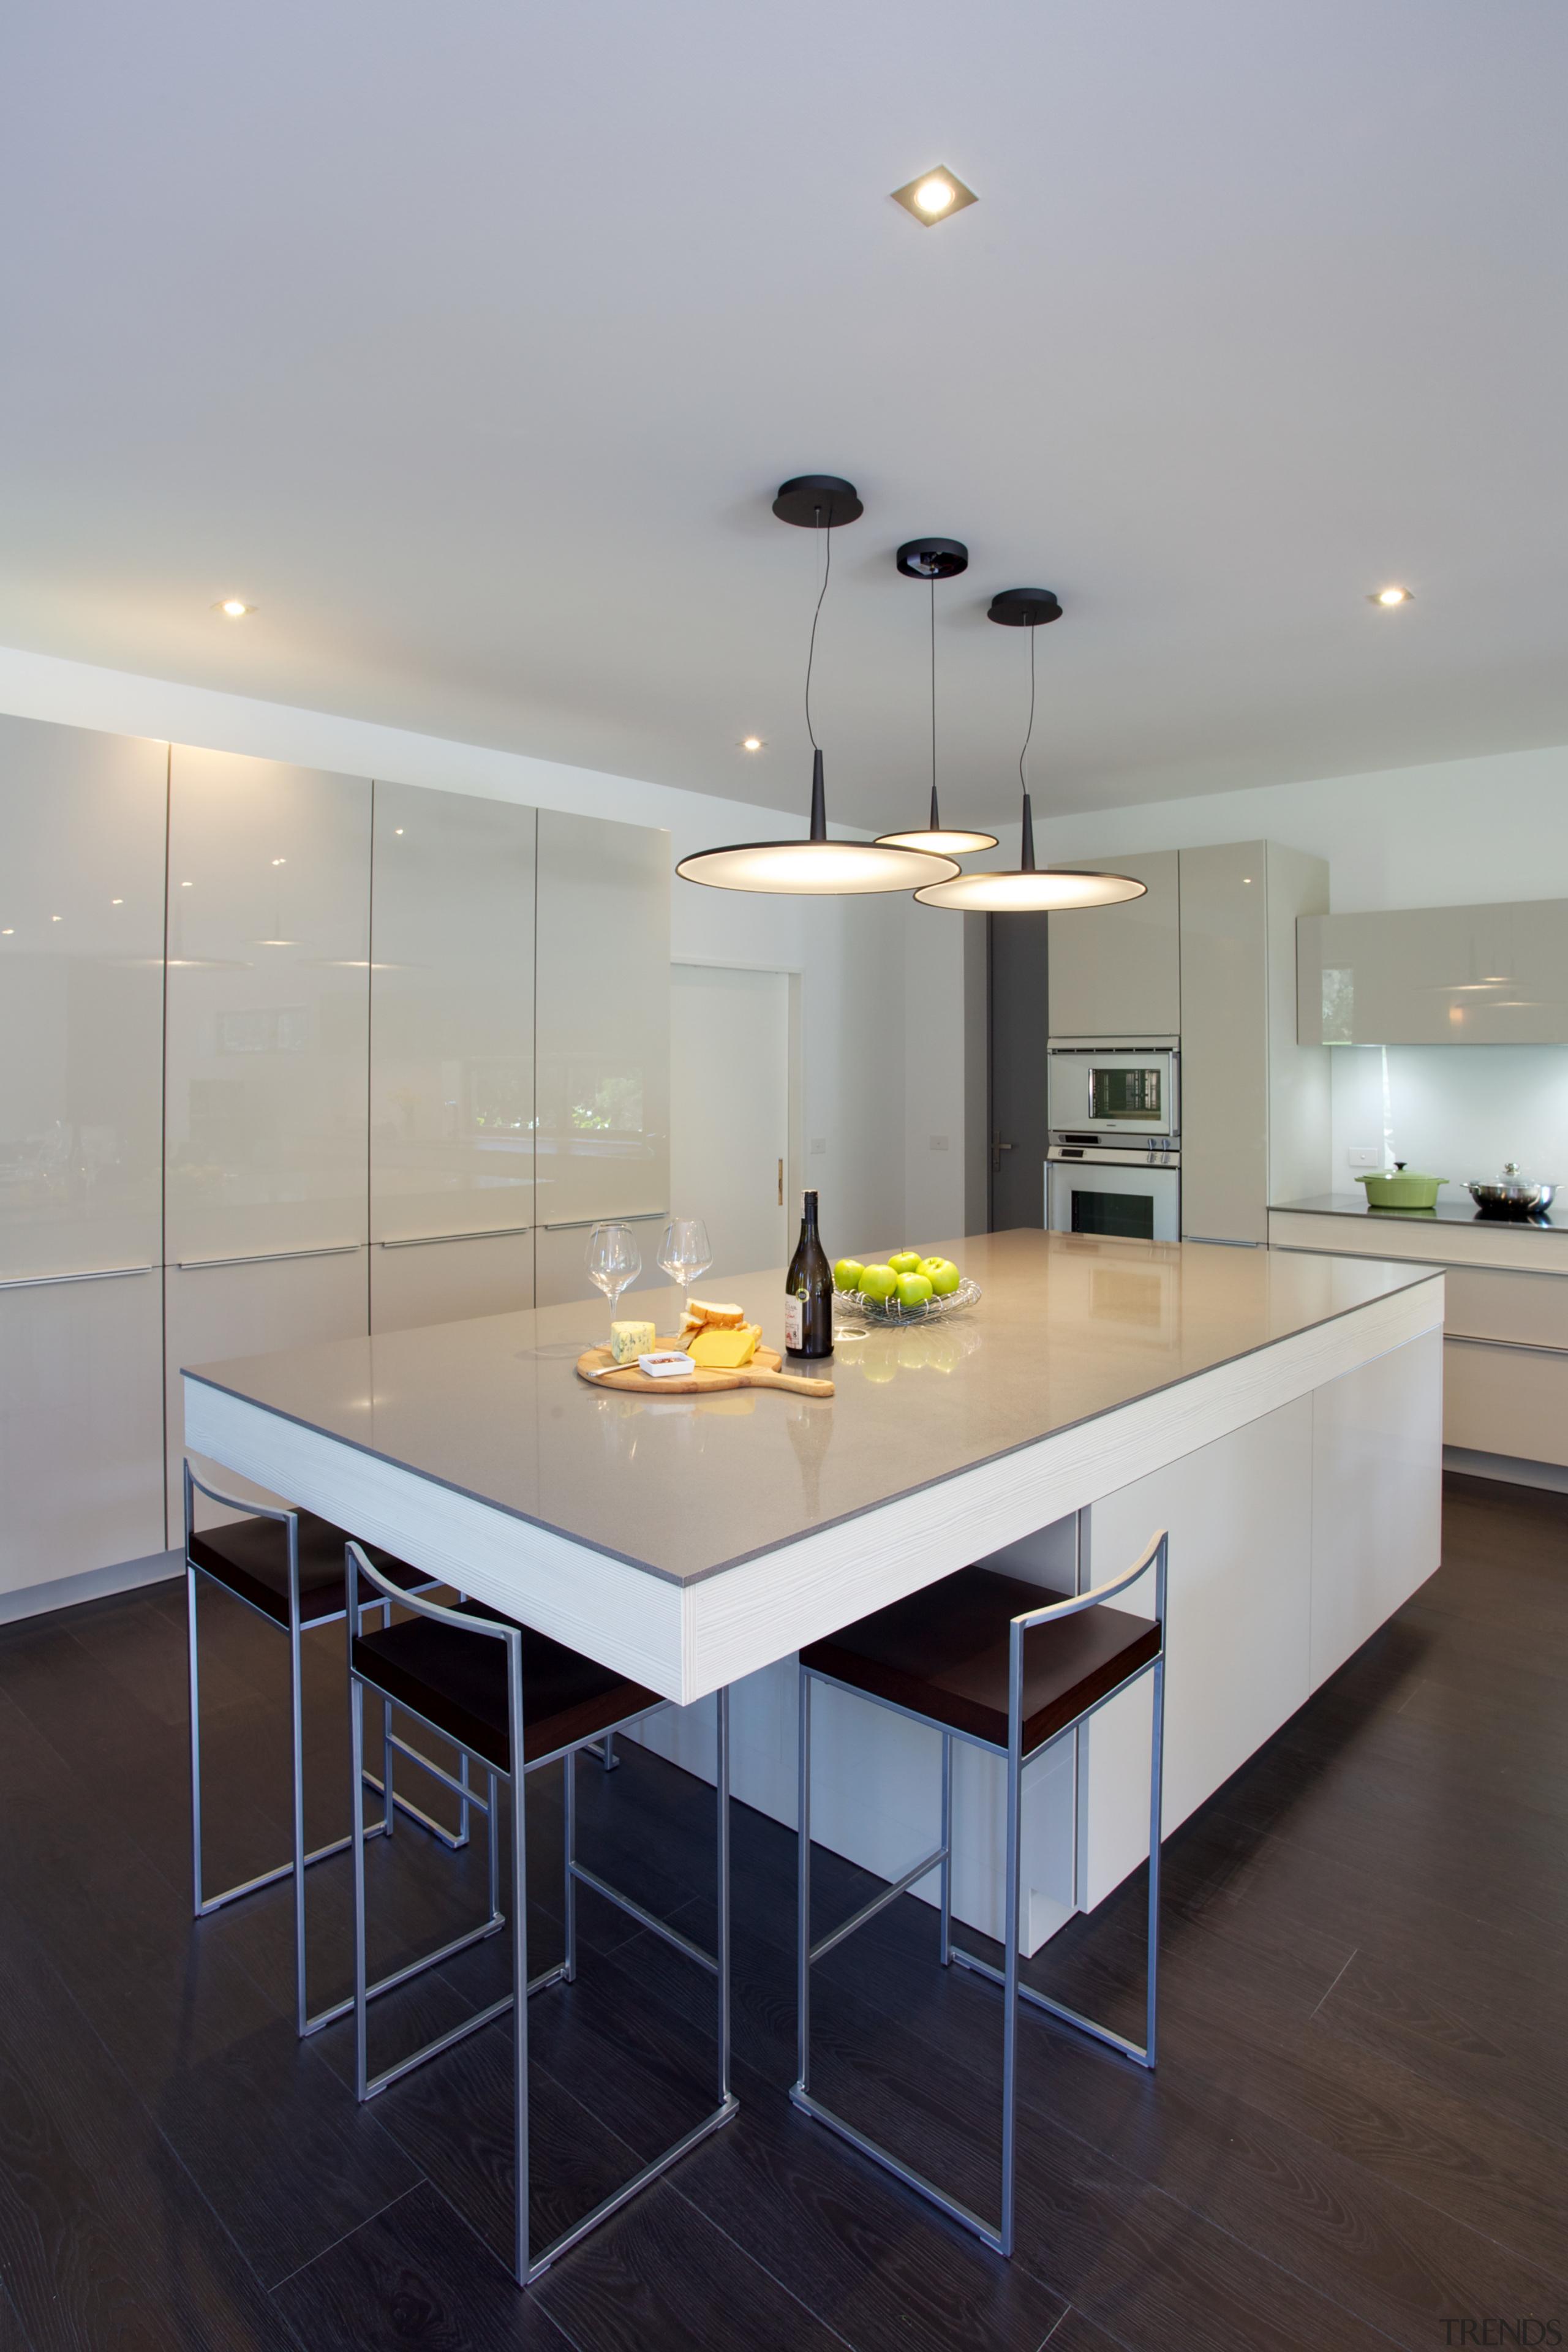 This Poggenpohl kitchen island and some perimeter cabinets architecture, countertop, interior design, kitchen, room, gray, black